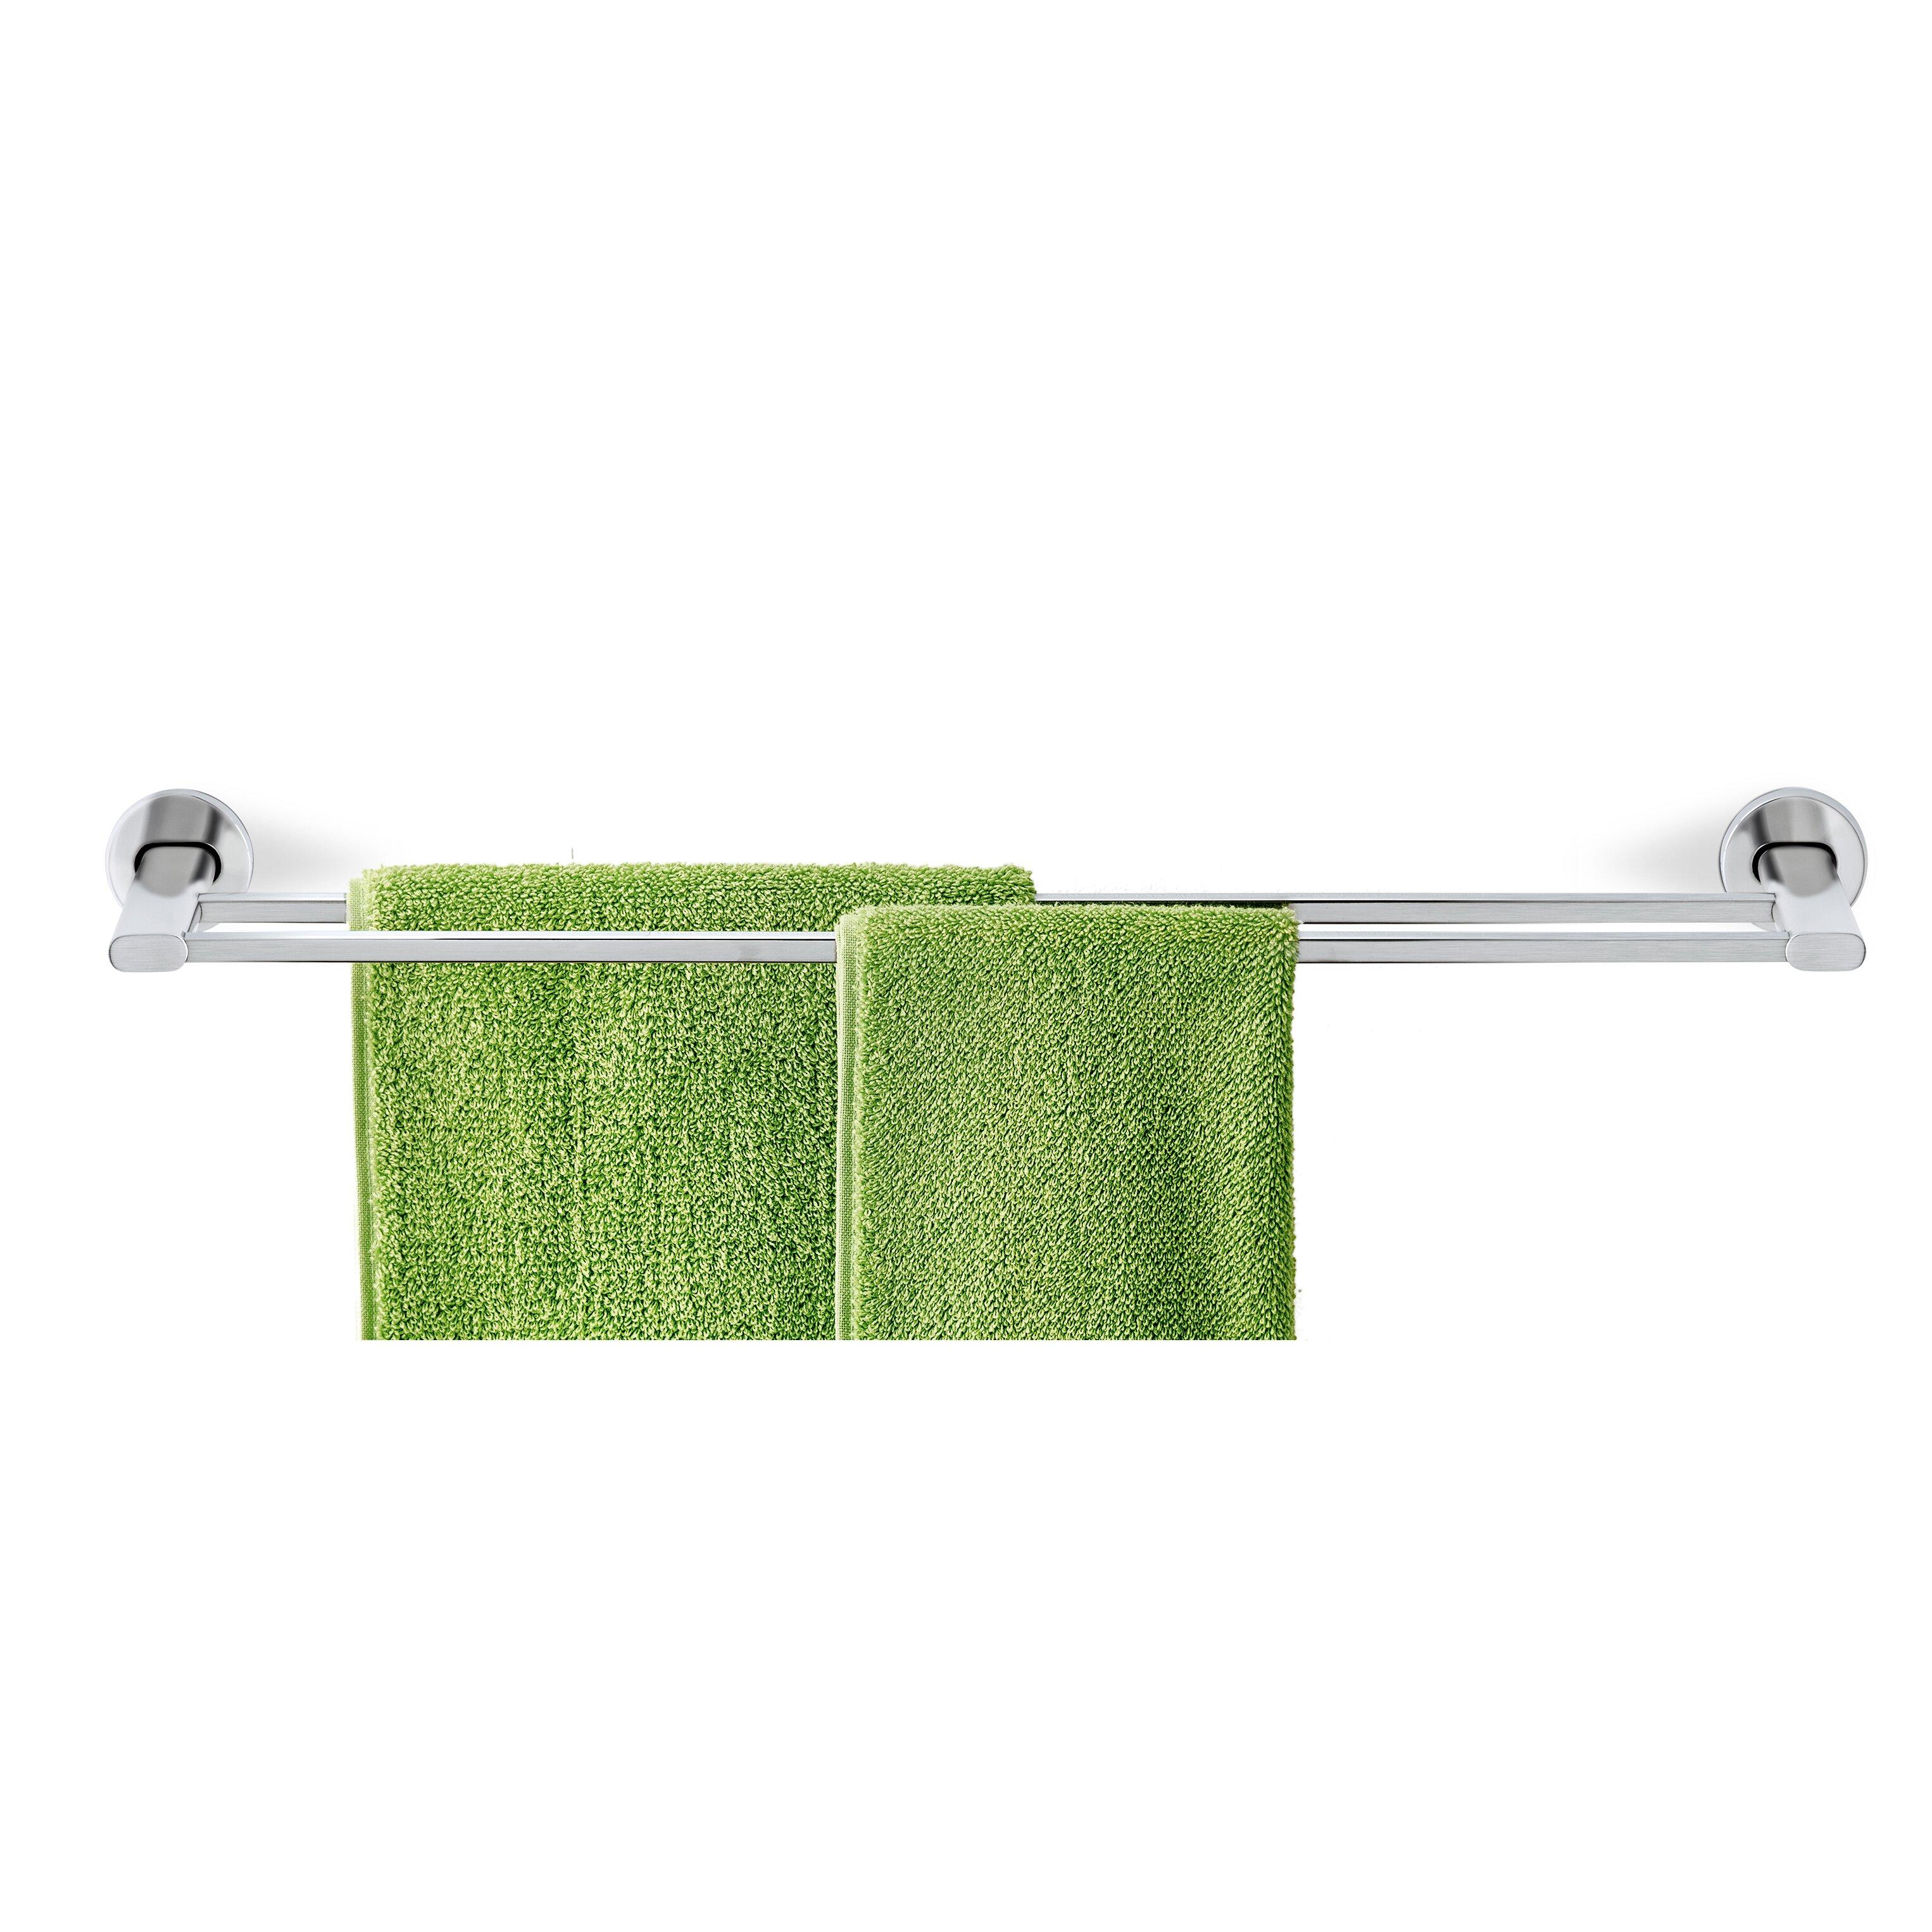 "Blomus Areo Twin 23.09"" Wall Mounted Towel Bar | Wayfair - Blomus Areo Twin 23.09"" Wall Mounted ..."